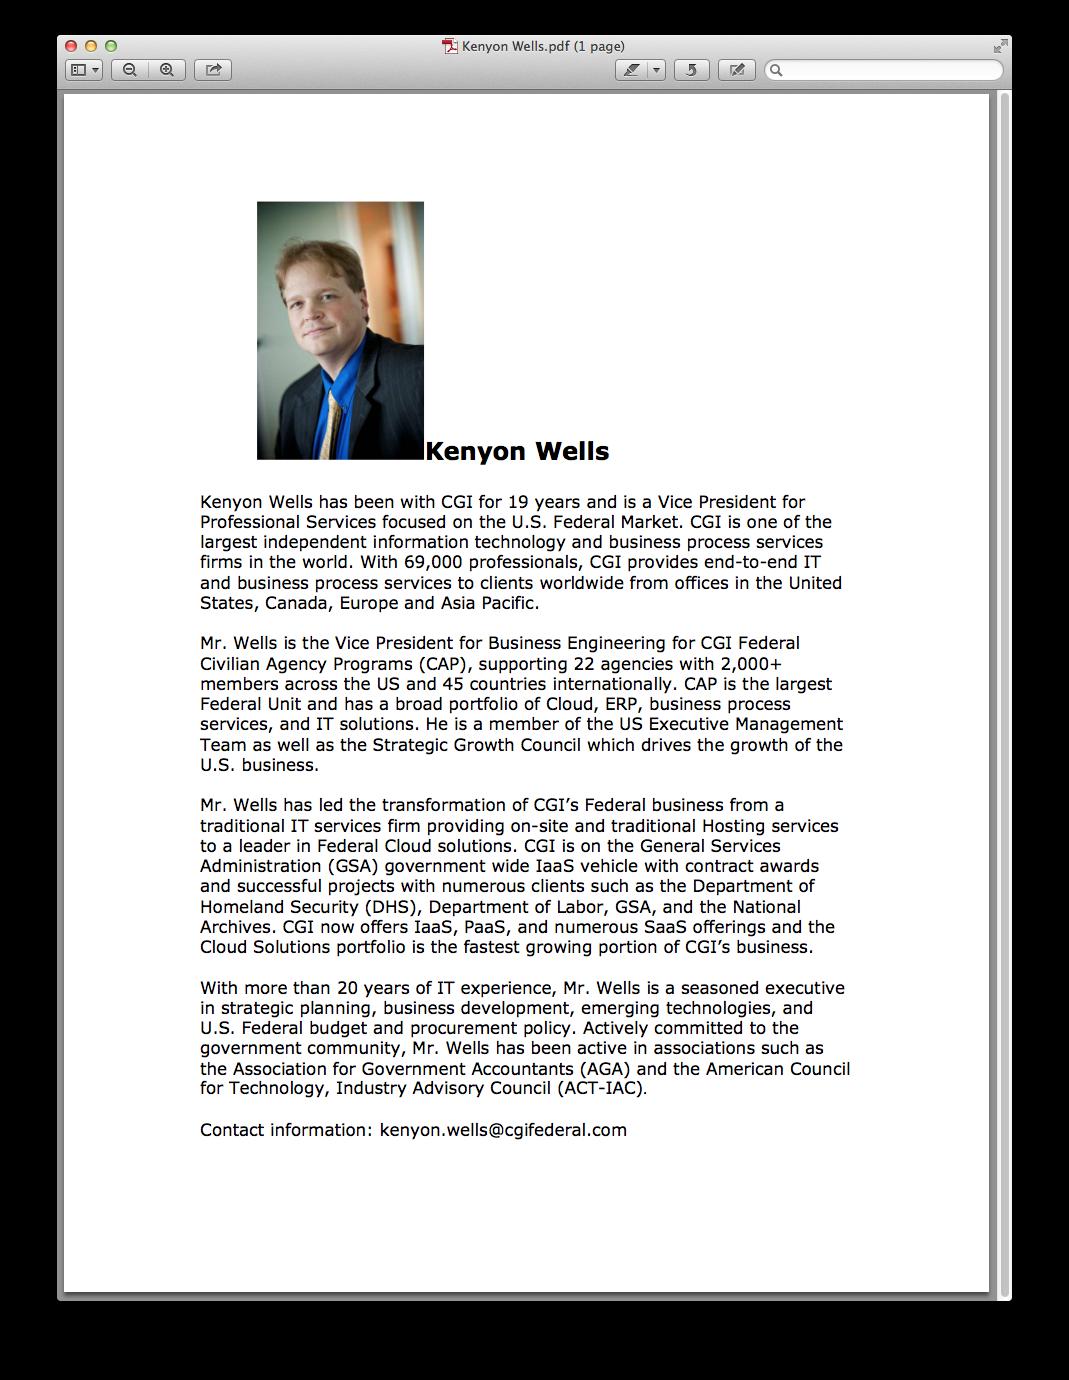 Kenyon Wells.pdf.png (1069×1380)